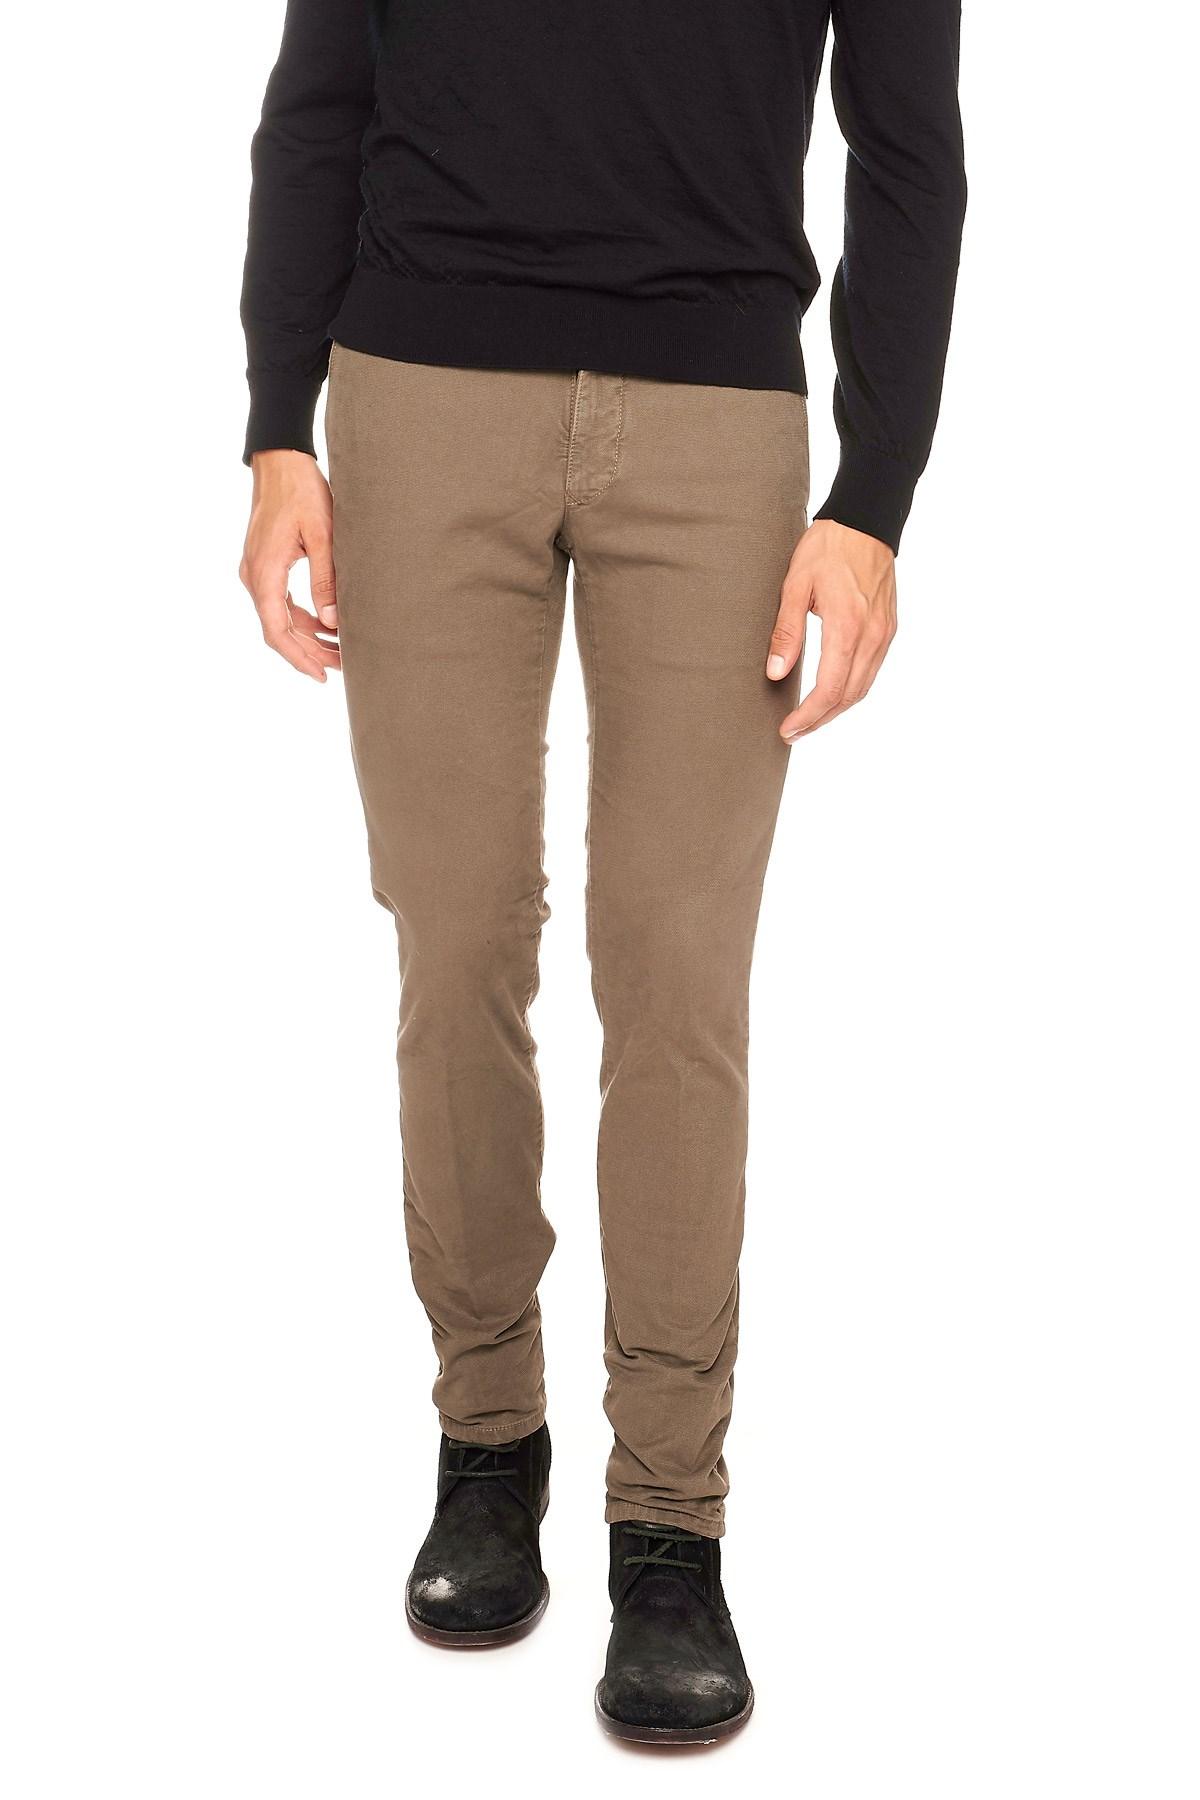 Incotex Chino Pants Available On Julian Fashion Com 56269